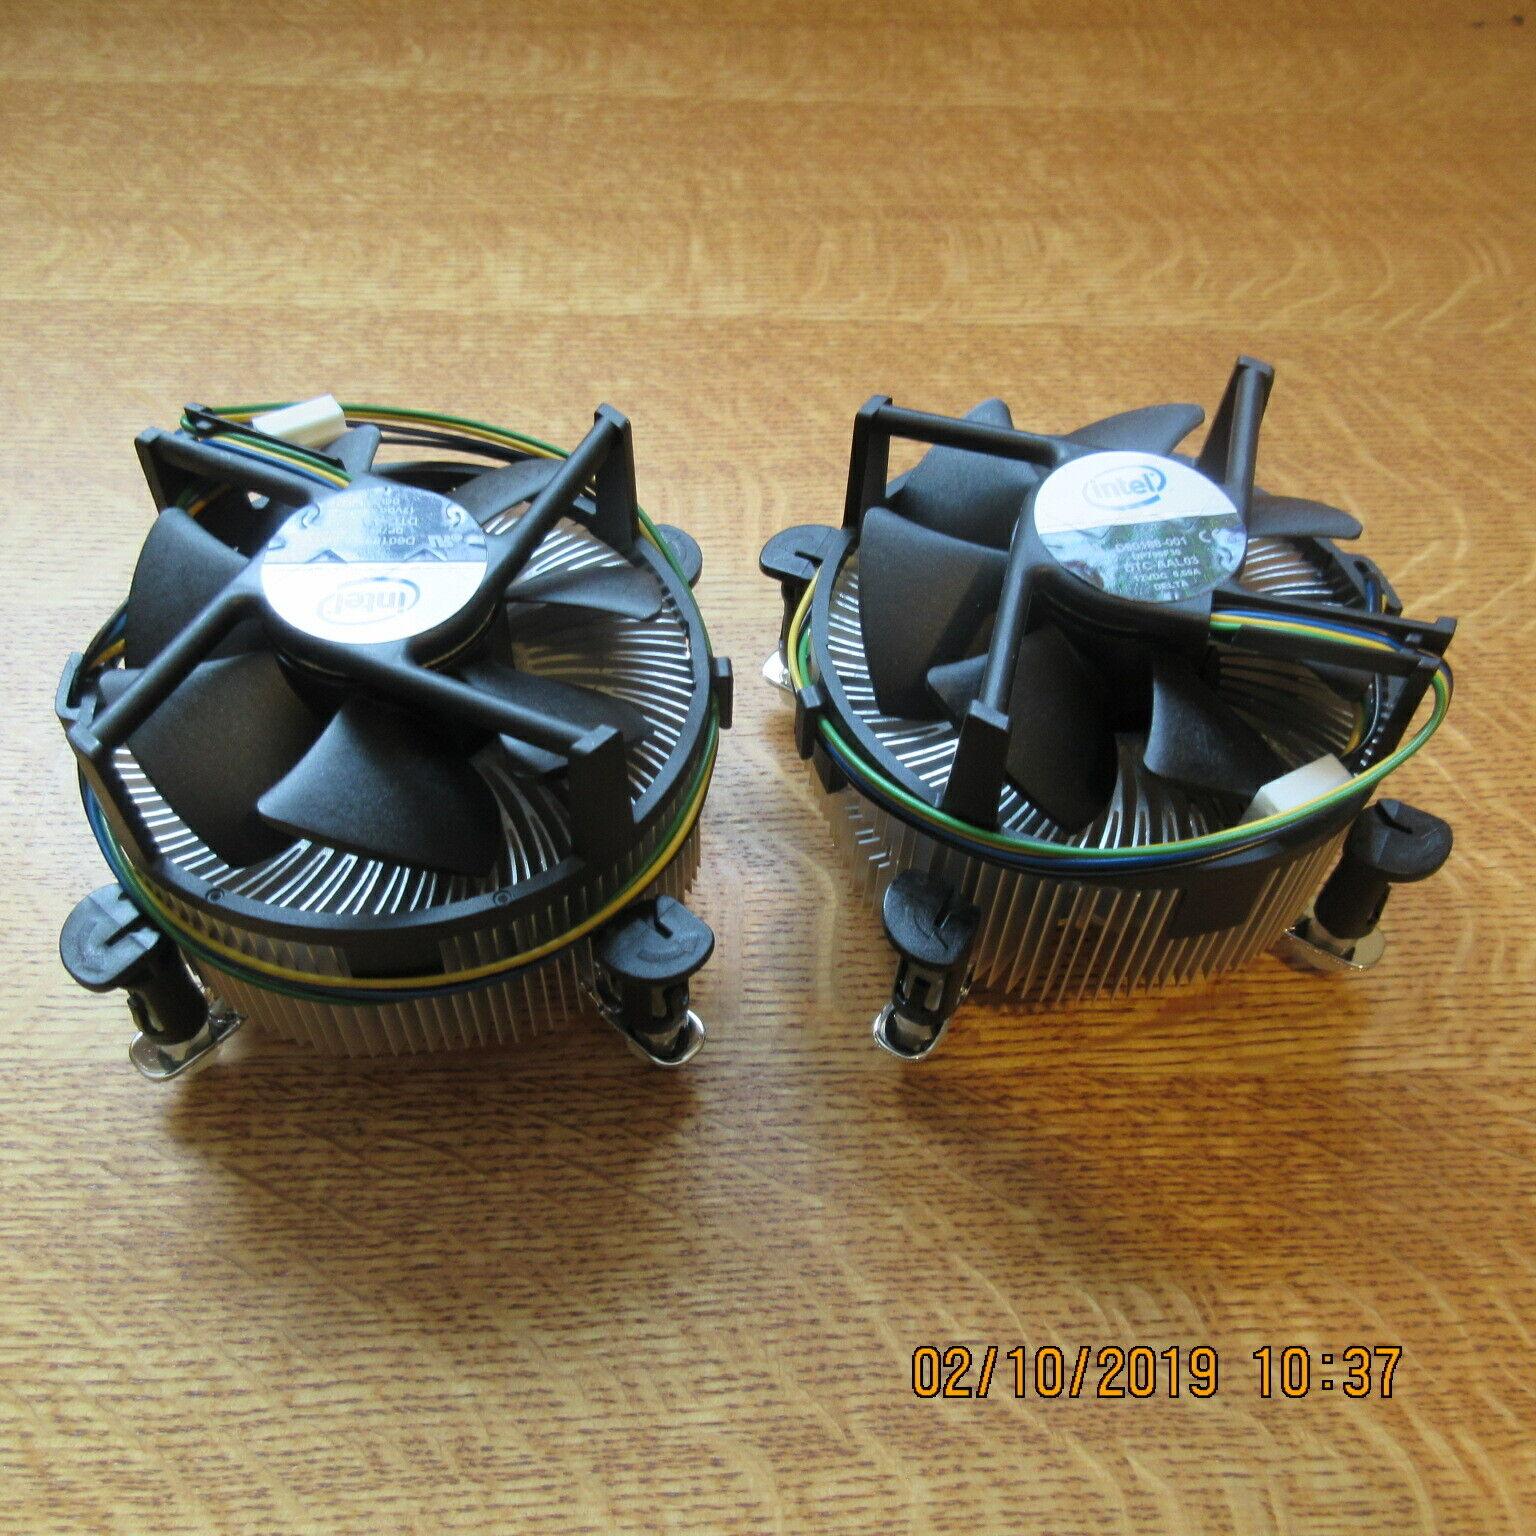 **NEW** Intel D60188-001 Socket LGA775 Copper Core CPU Heatsink and Fan Lot of 2